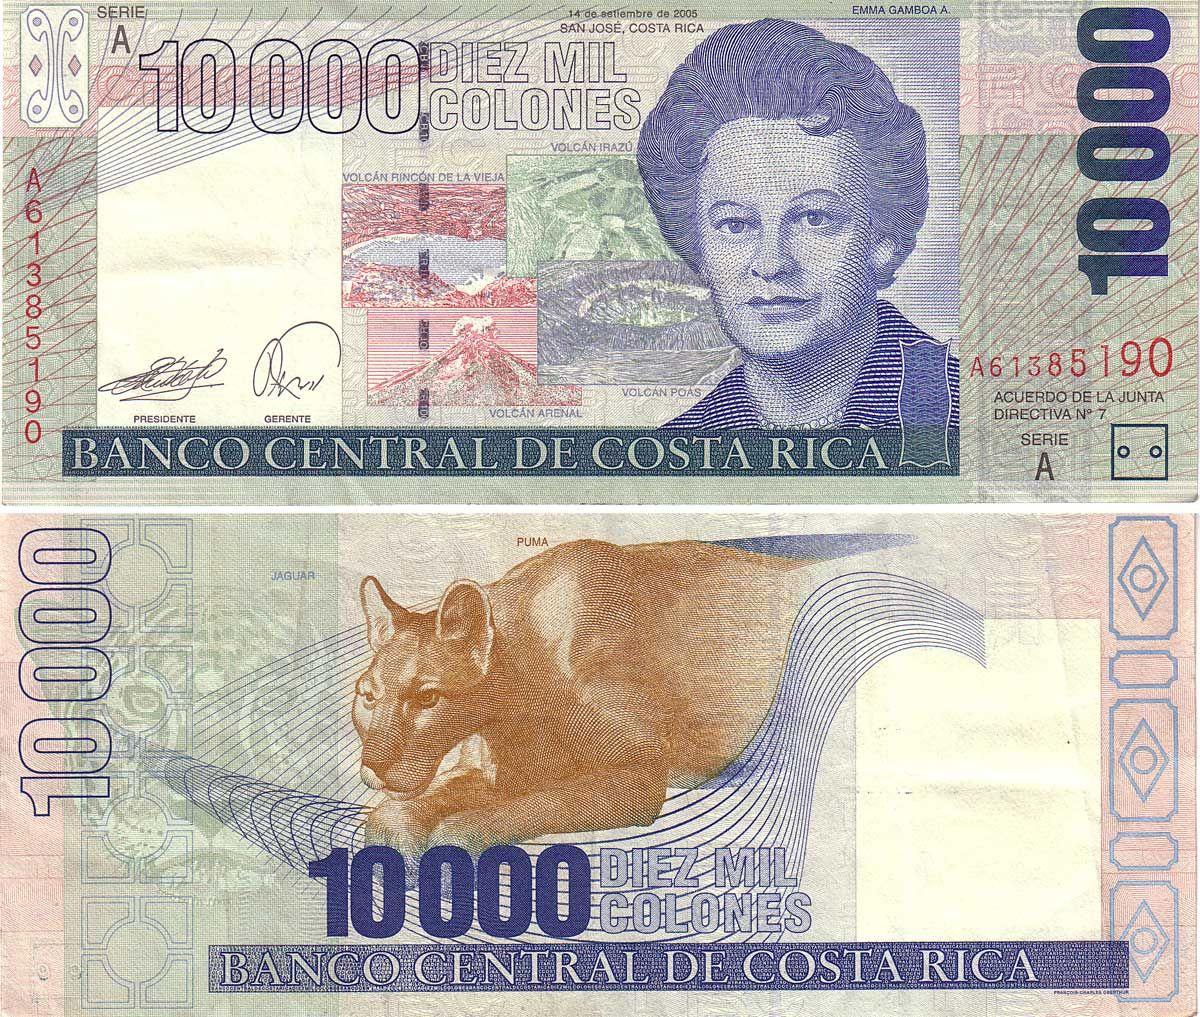 Papiergeld Welt Karibik Clever Barbados 10 Dollars 2013 Unc P 75